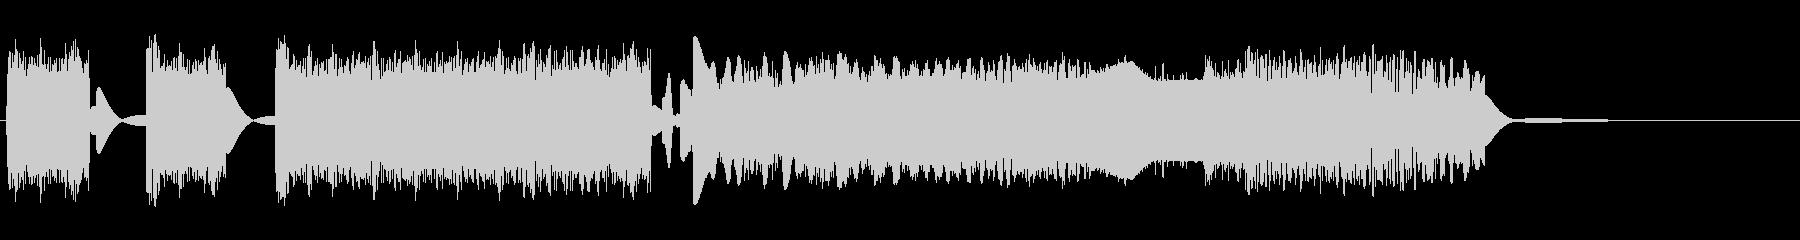 RADIO WAVE ZAPの未再生の波形